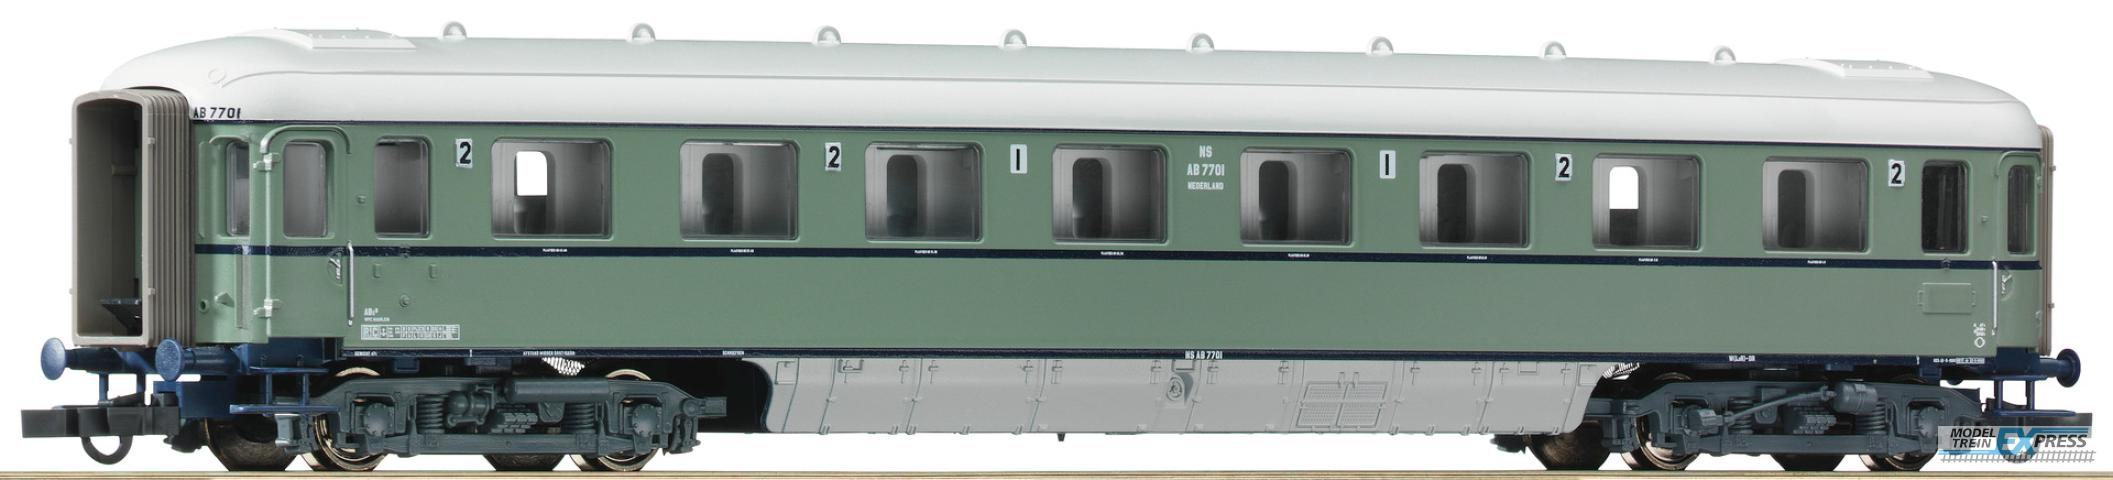 Roco 64996.1